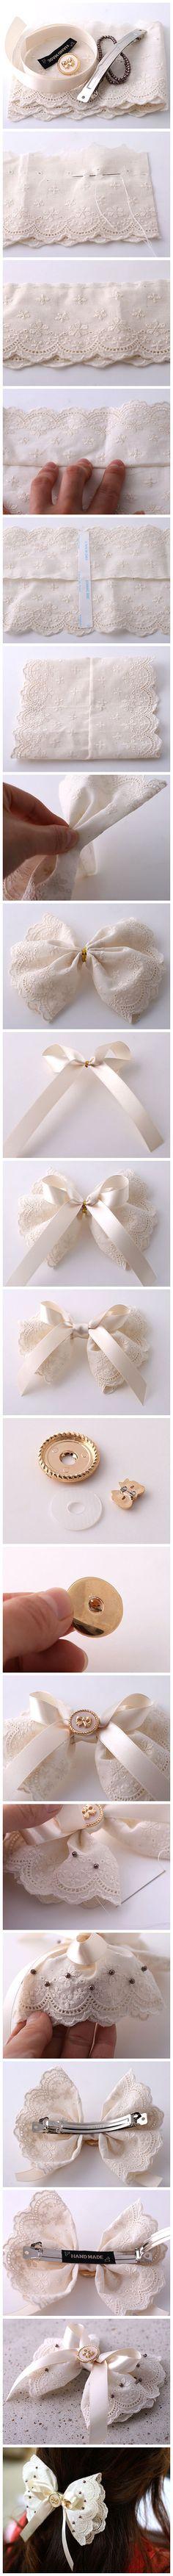 DIY Cute Bow